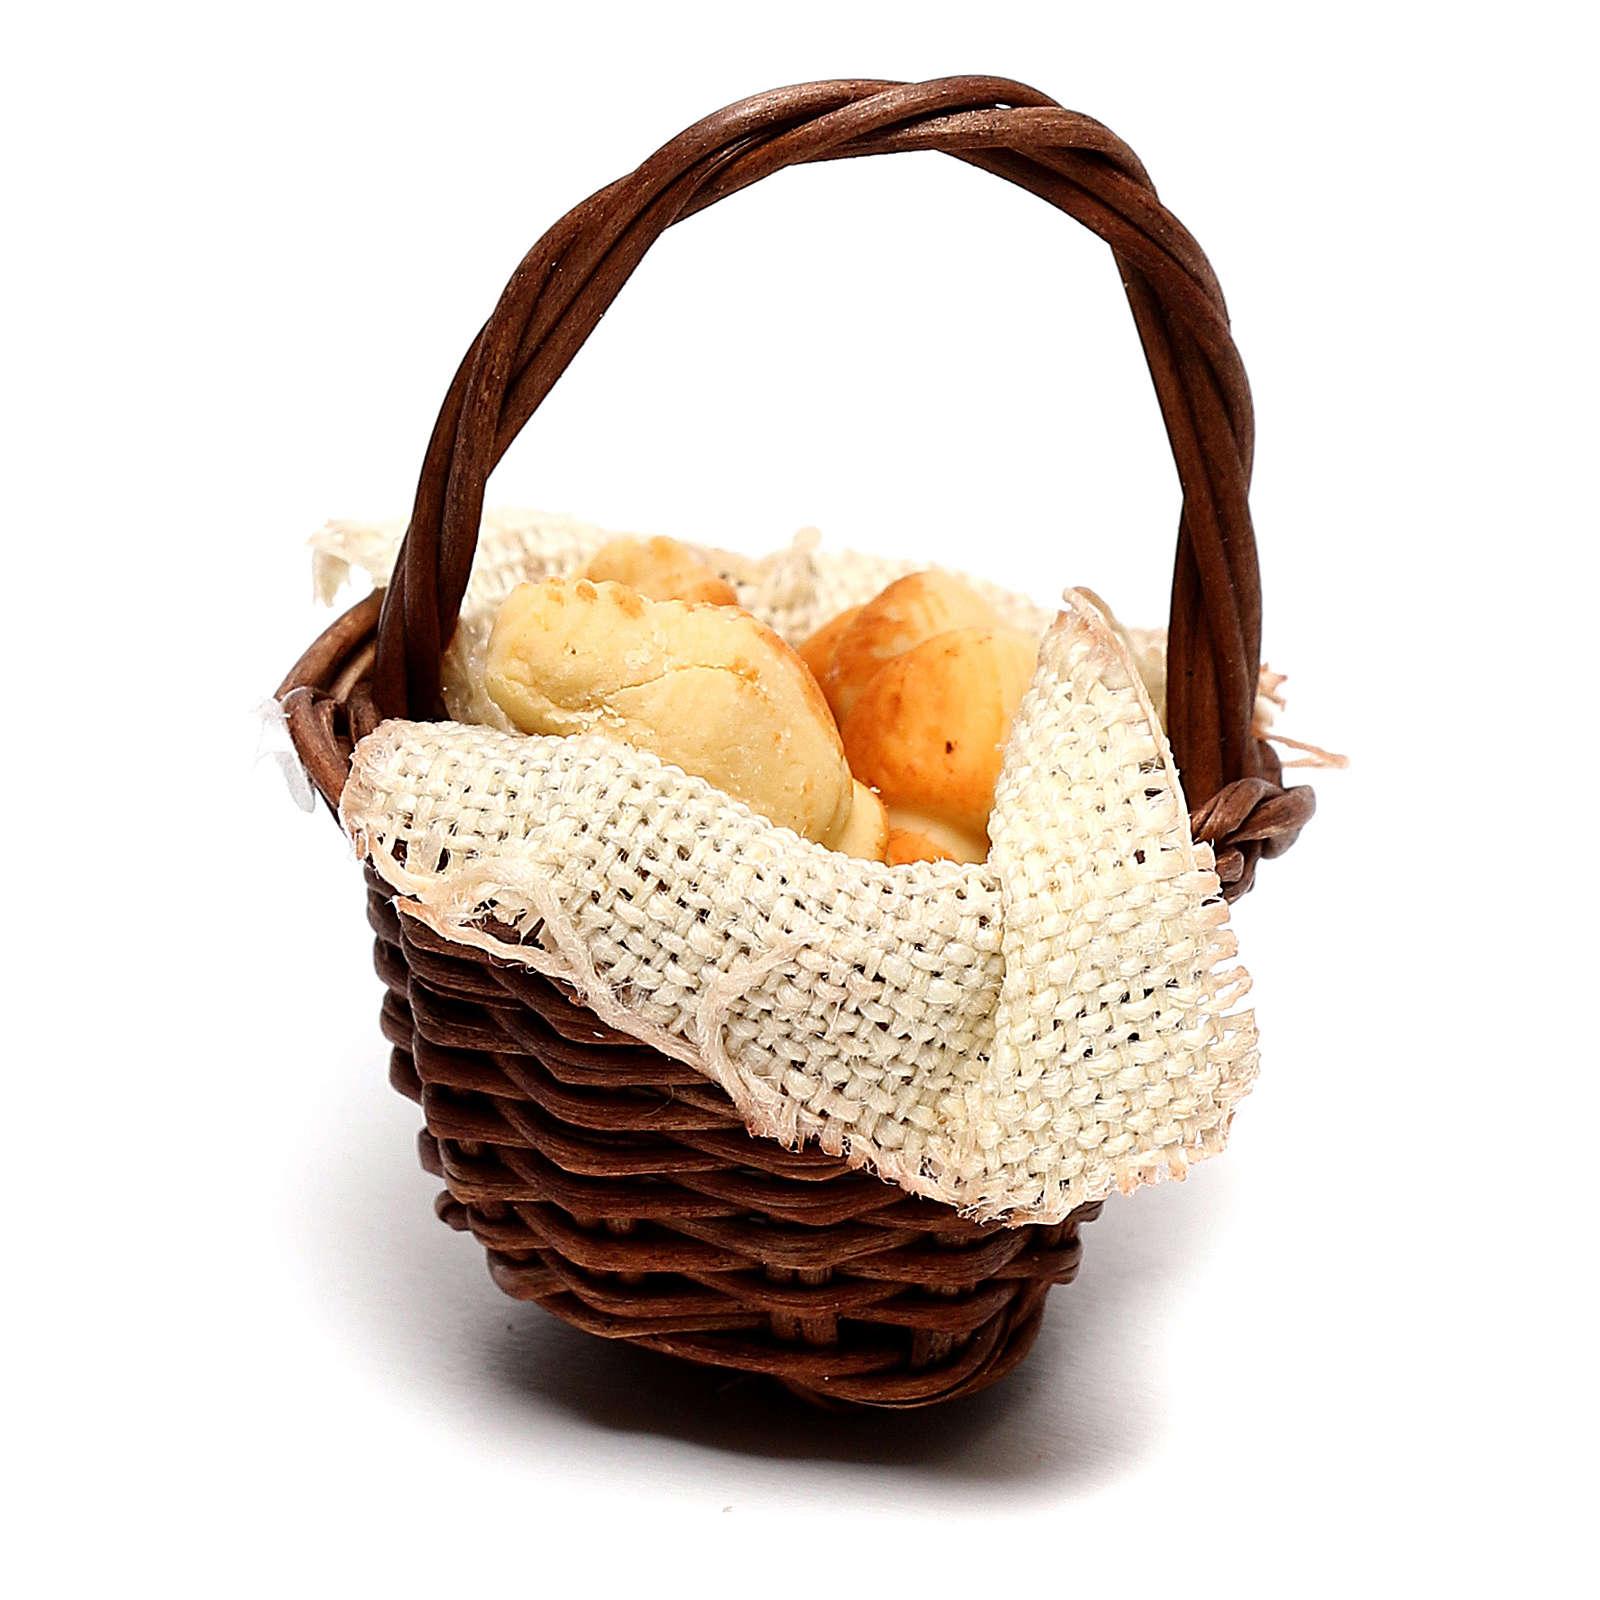 Basket with croissants for Neapolitan Nativity scene of 12 cm 4